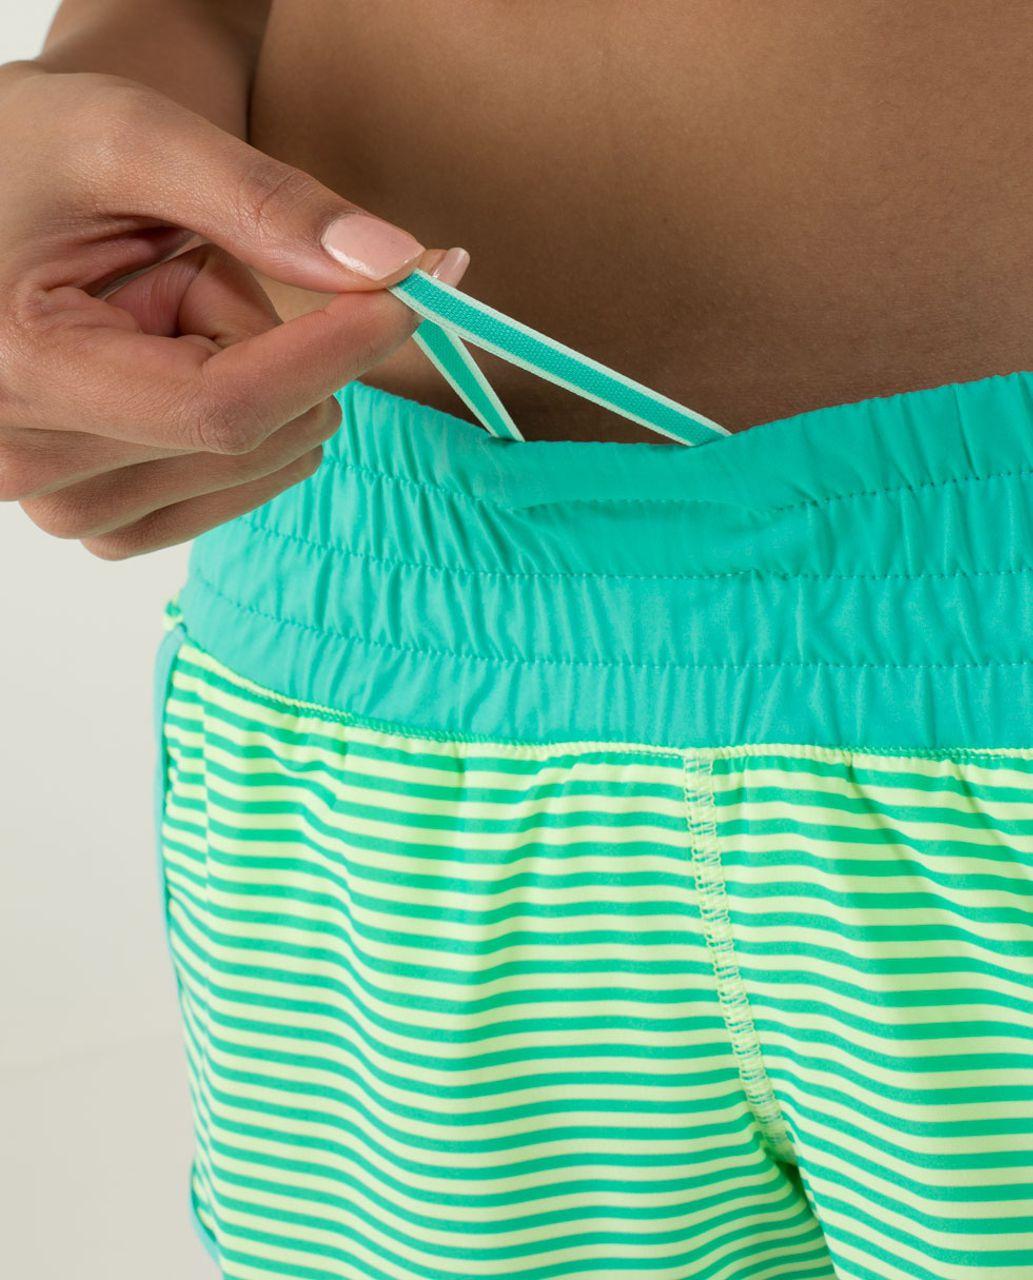 Lululemon Tracker Short II *4-way Stretch - 1 / 8 Stripe Printed Bali Breeze / Bali Breeze / Clear Mint